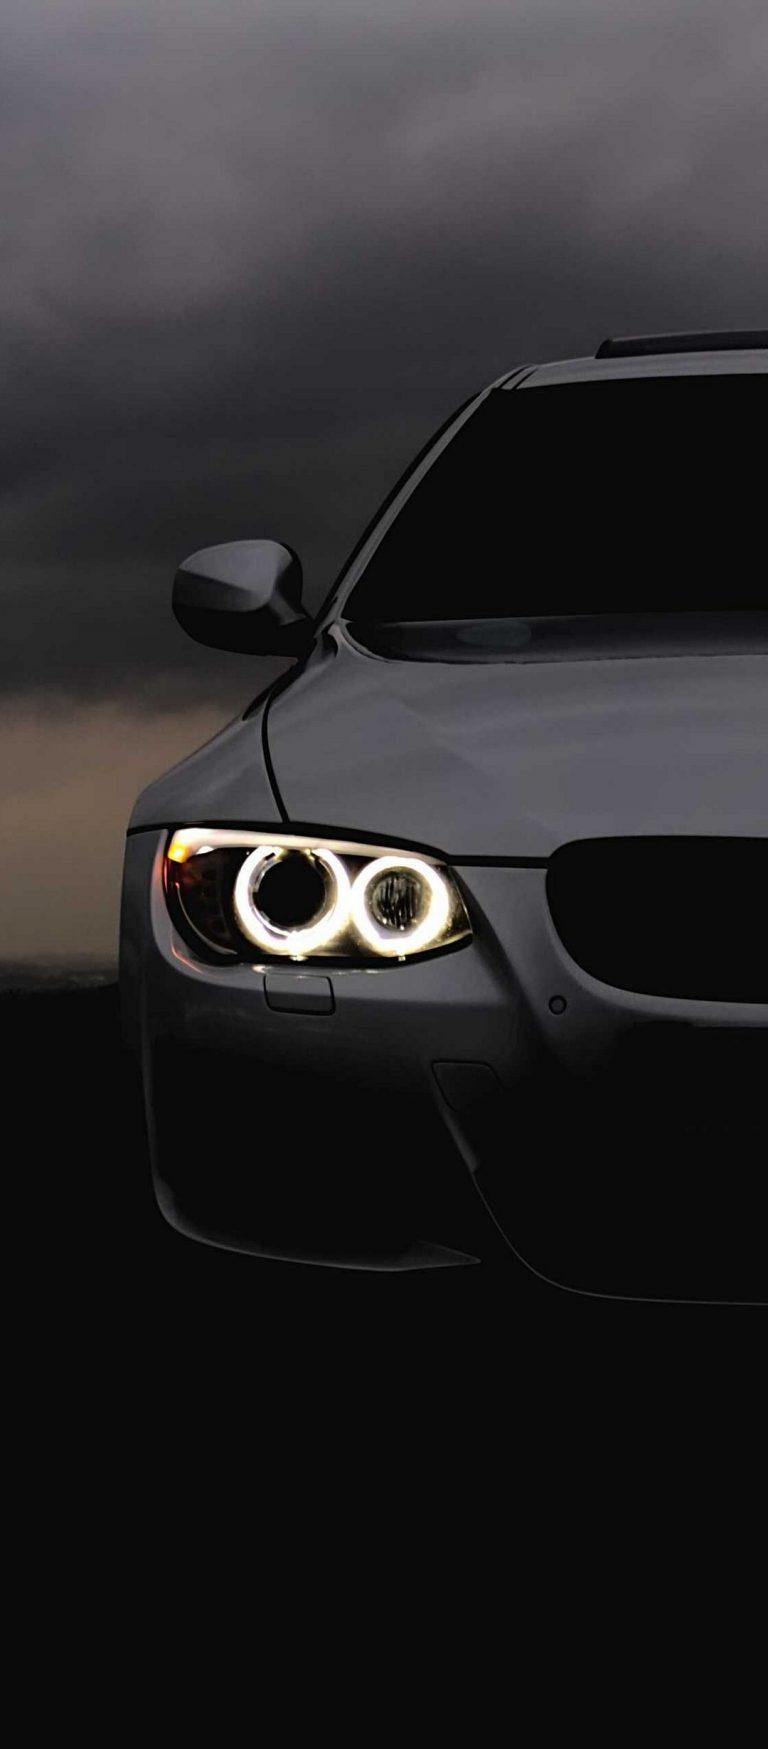 Bmw Headlights Car 1080x2460 768x1749